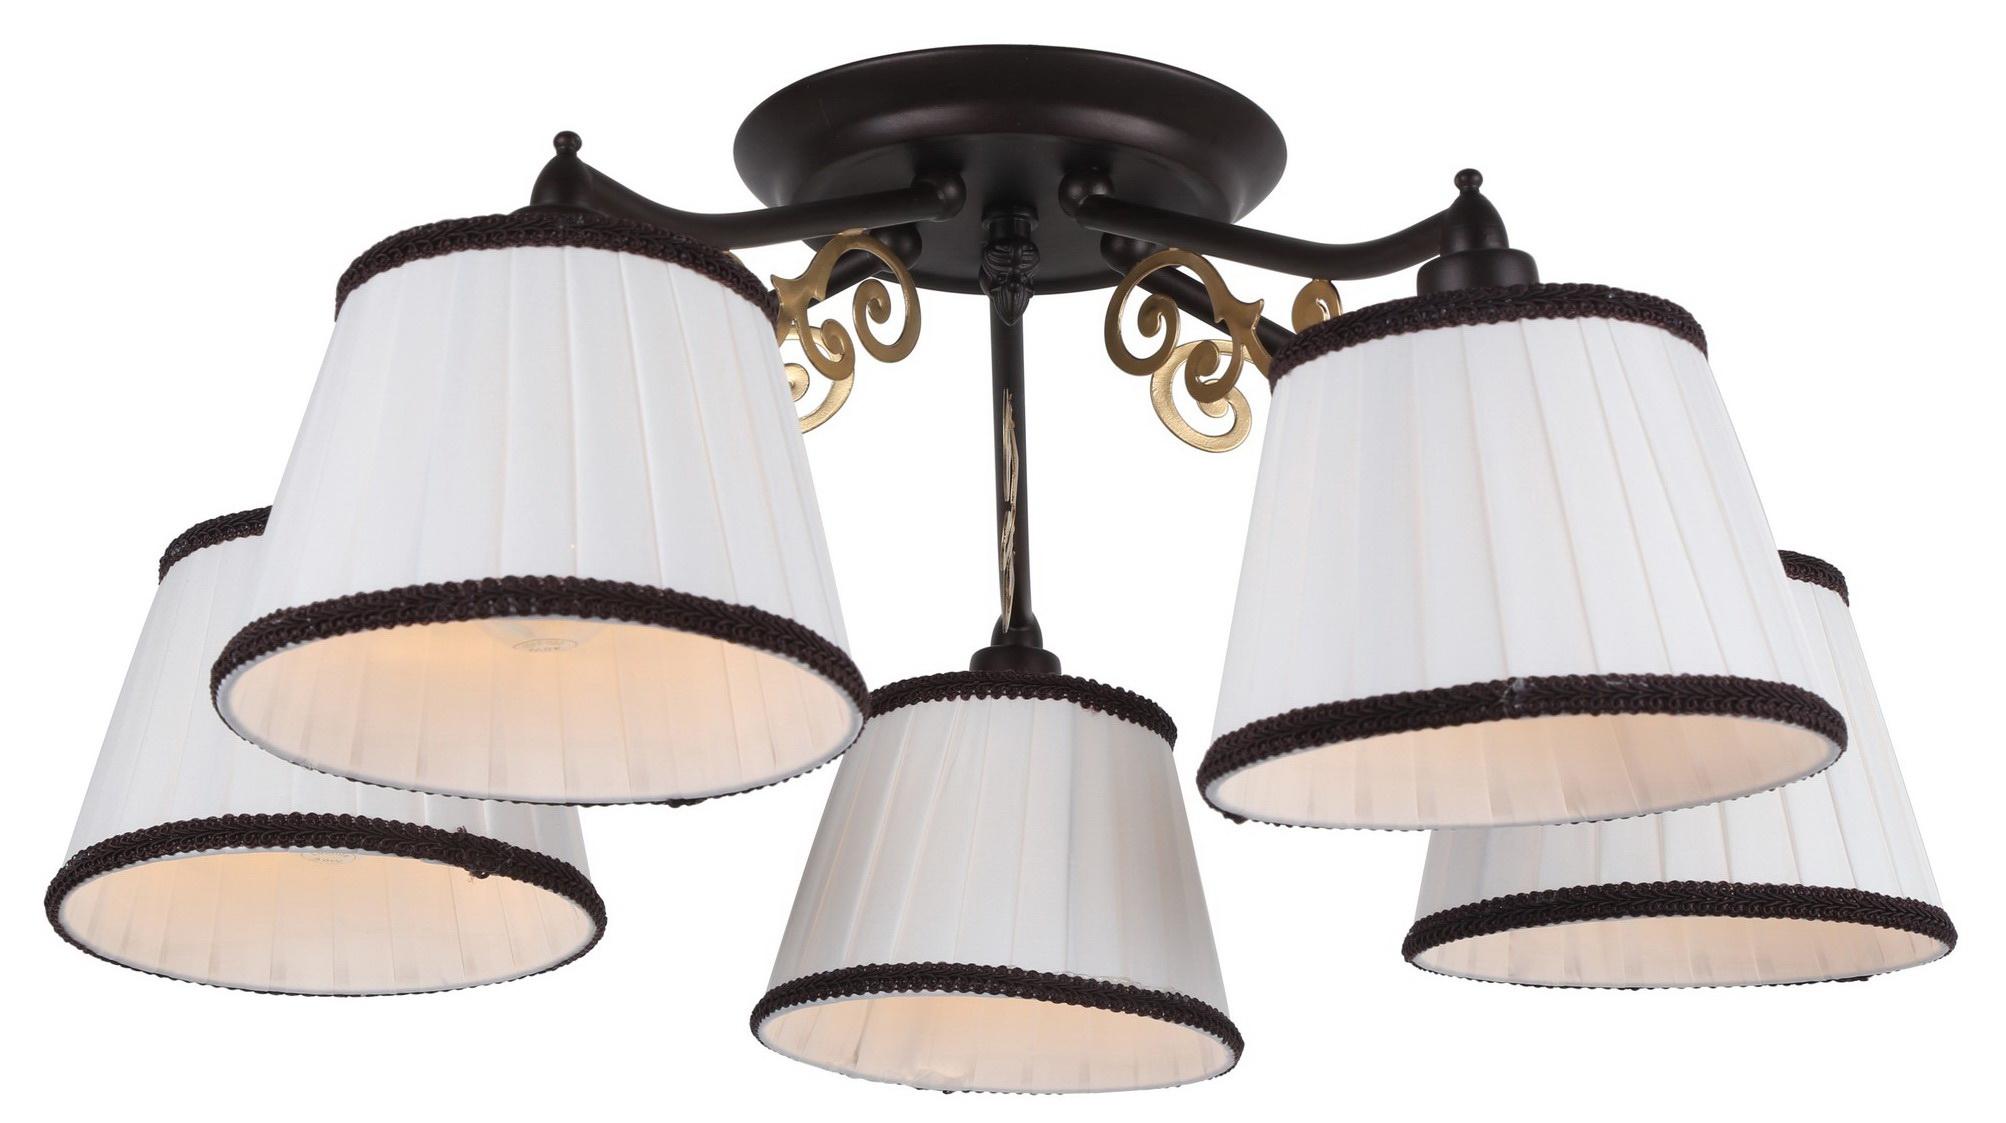 Люстра Arte lamp Capri a6344pl-5br